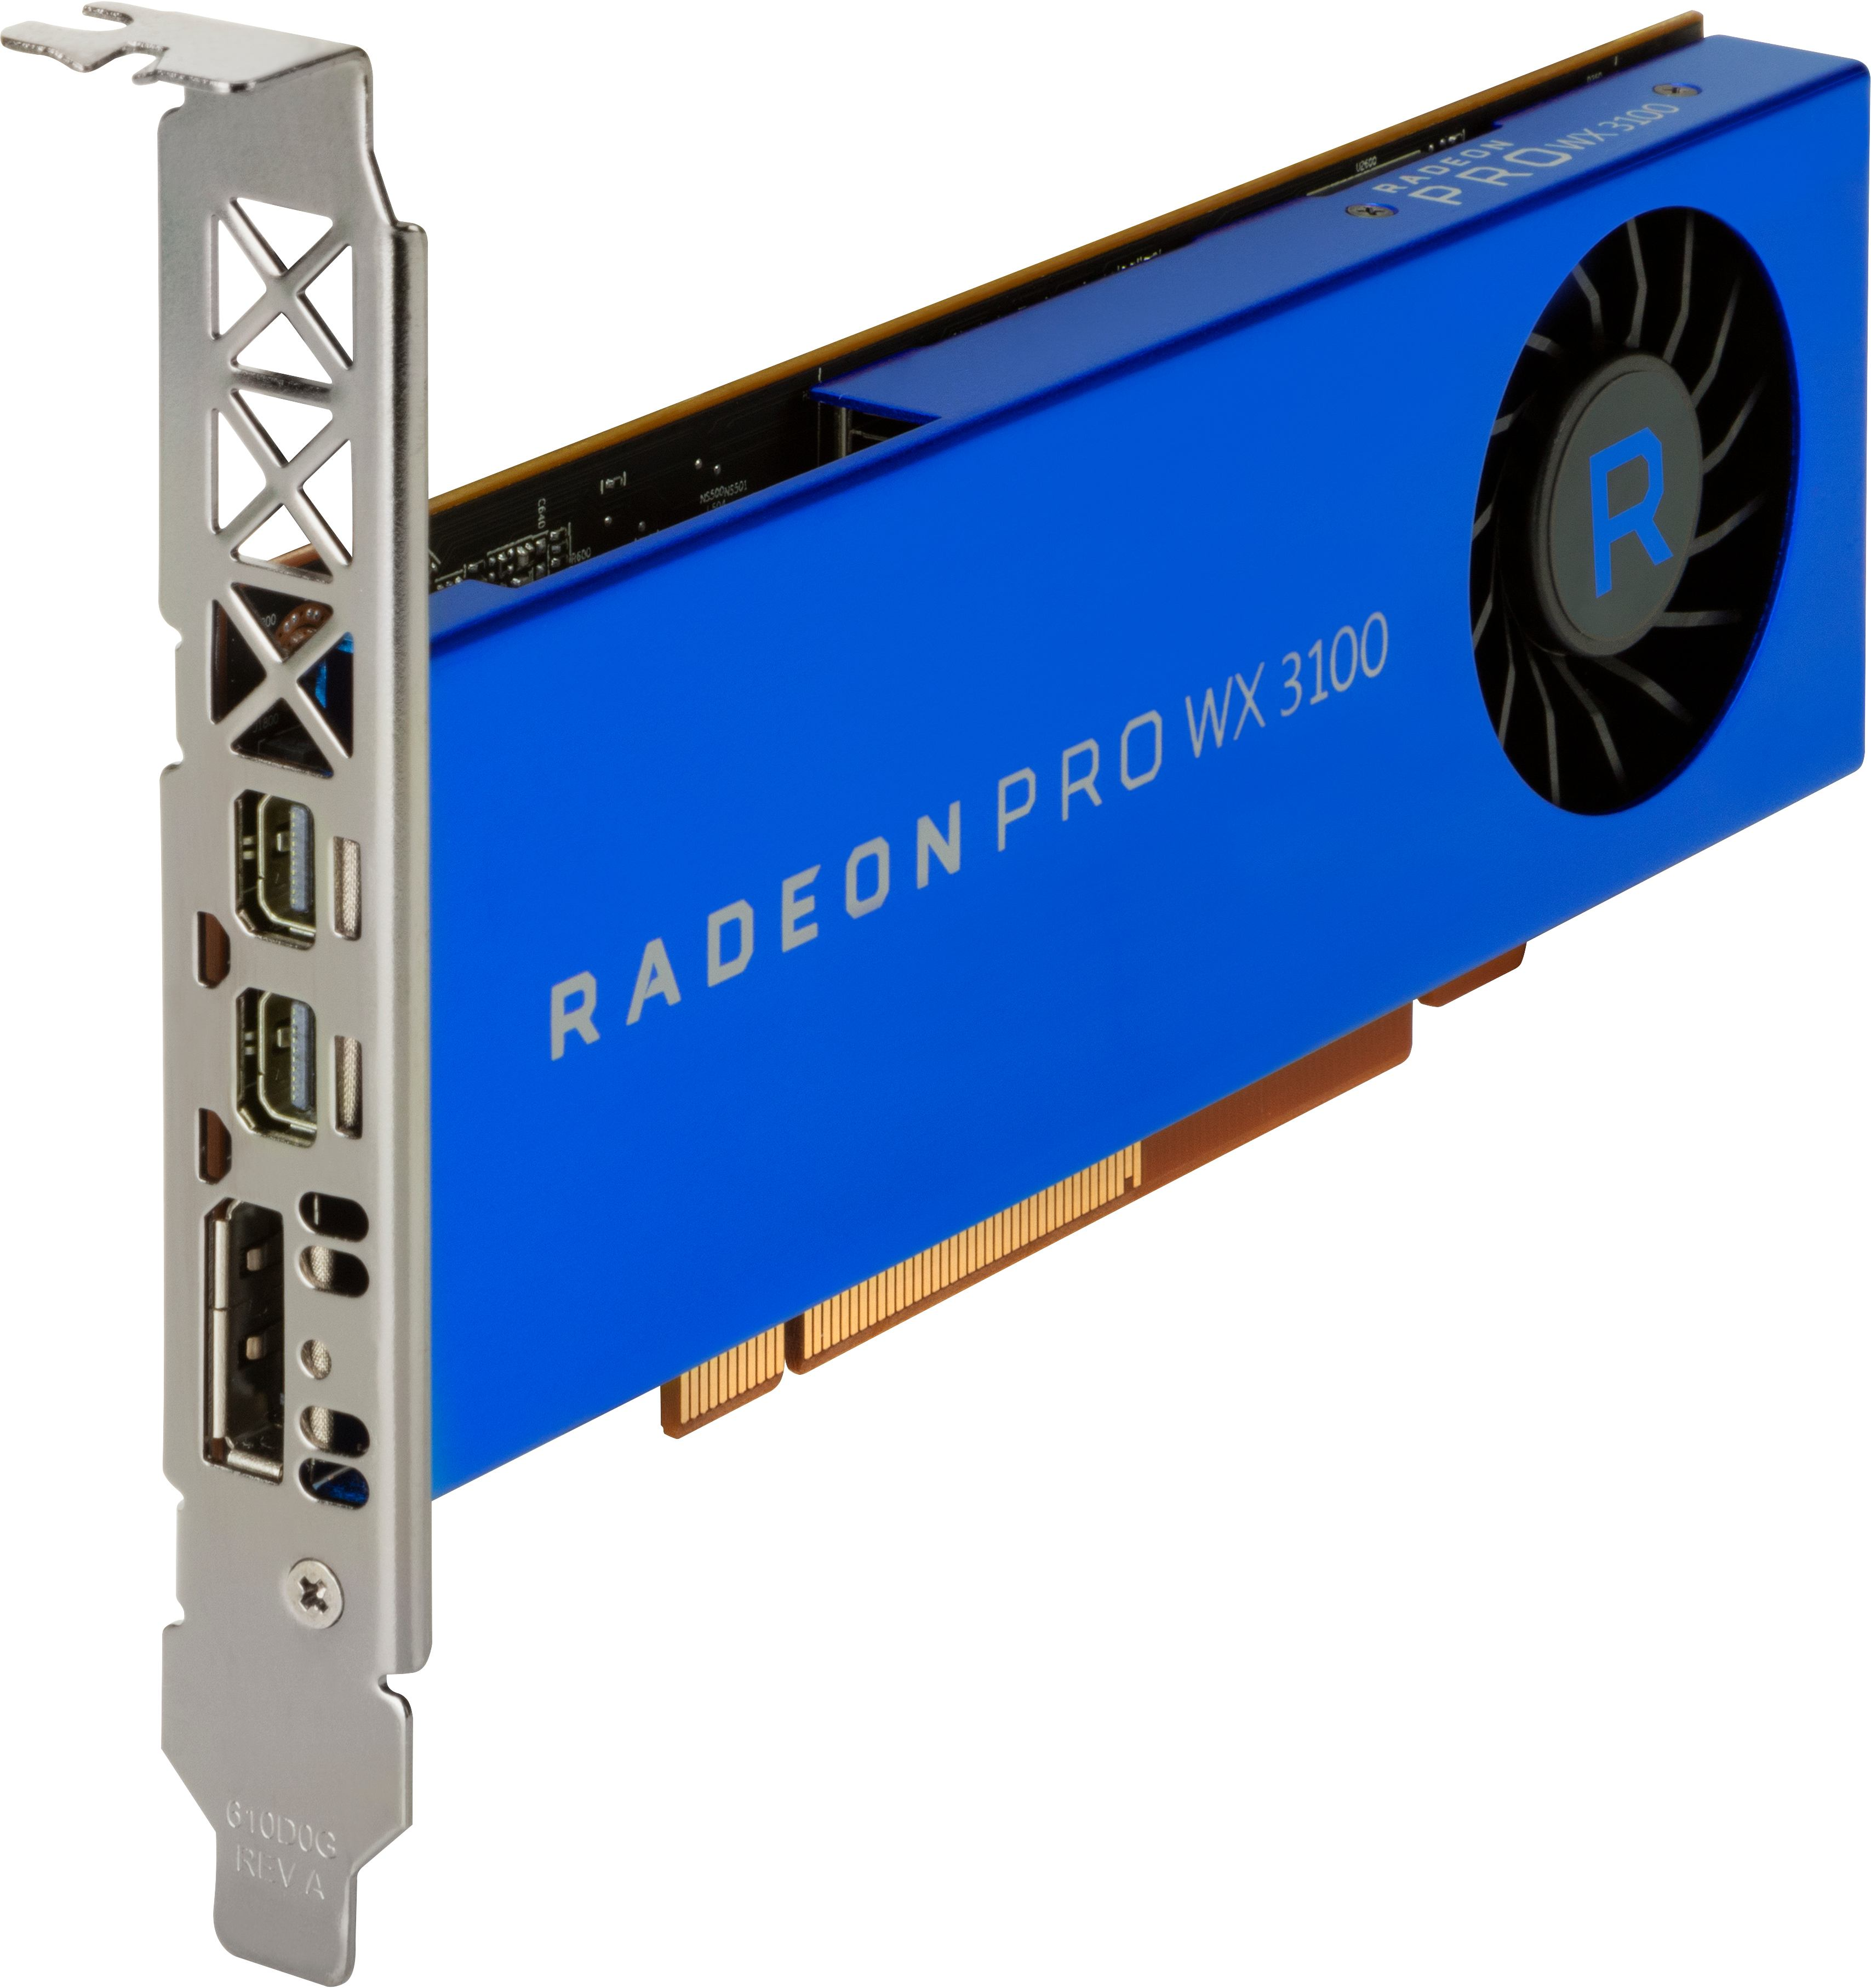 2061579-HP-2TF08AT-scheda-video-Radeon-Pro-WX-3100-4-GB-GDDR5-RADEON-PRO-WX-310